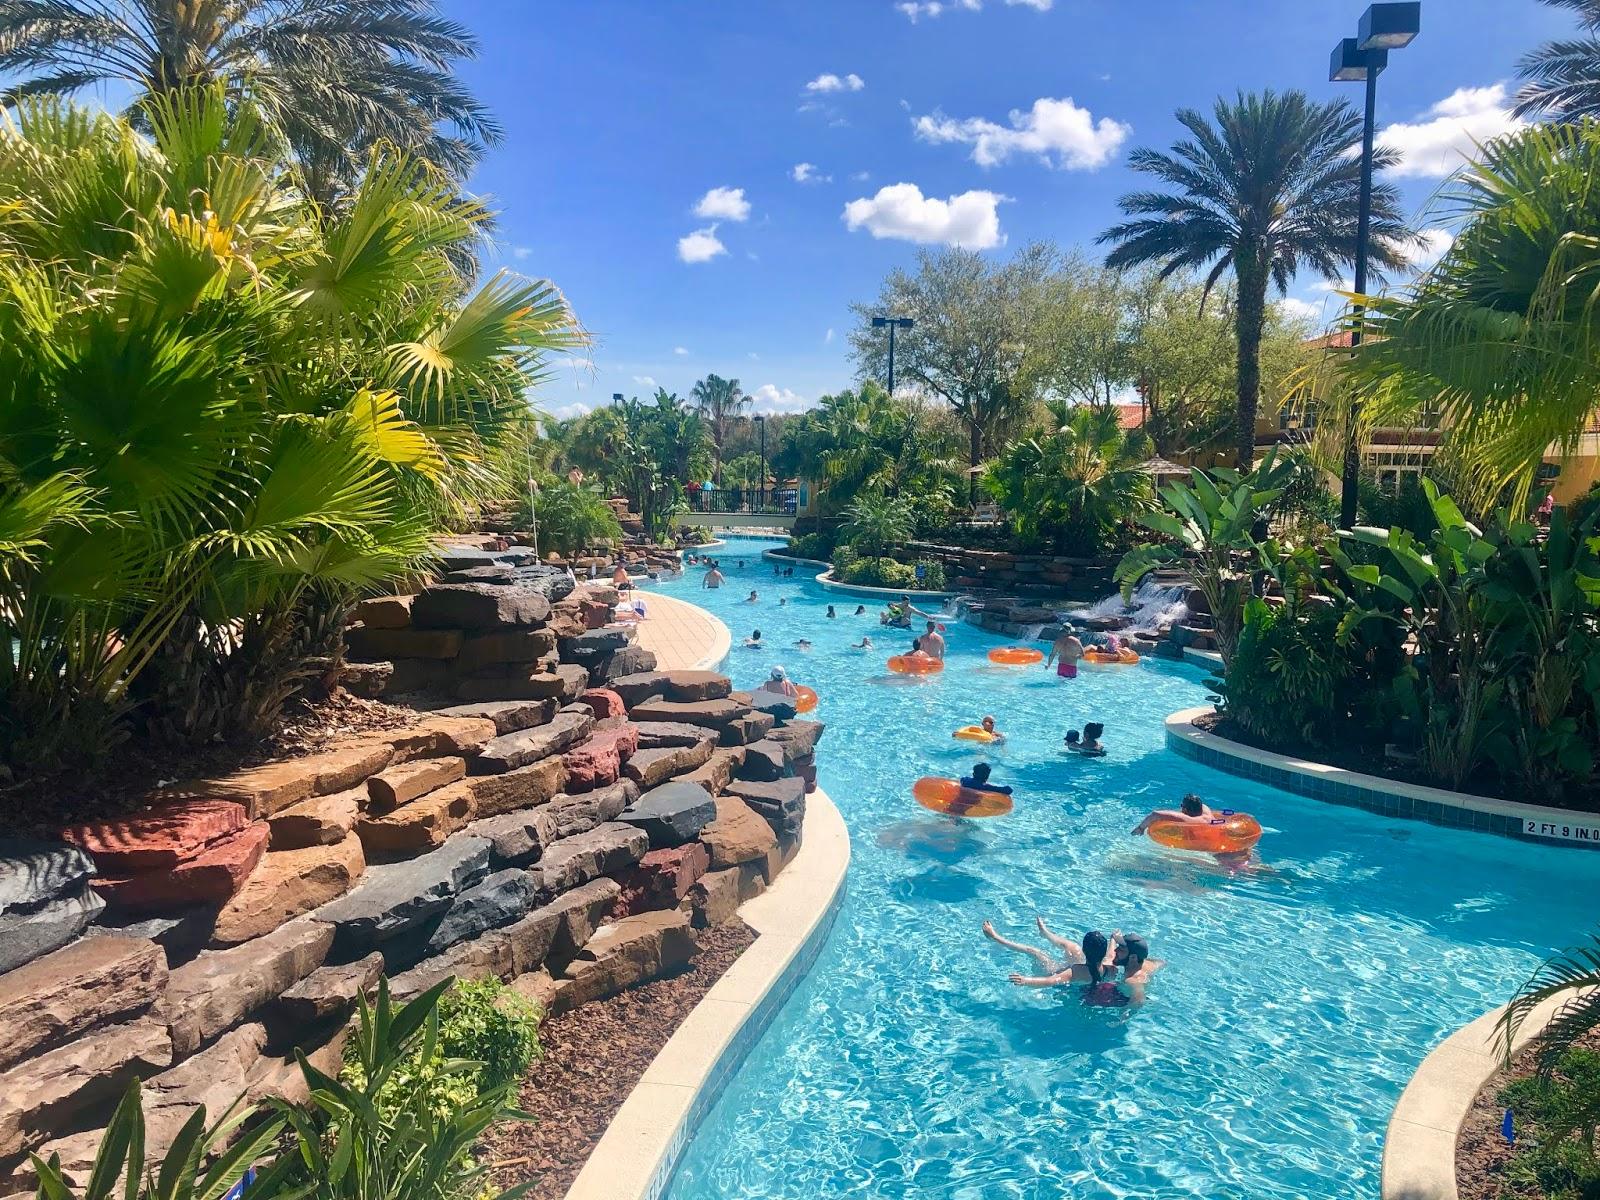 river island holiday inn club vacations orange lake resort